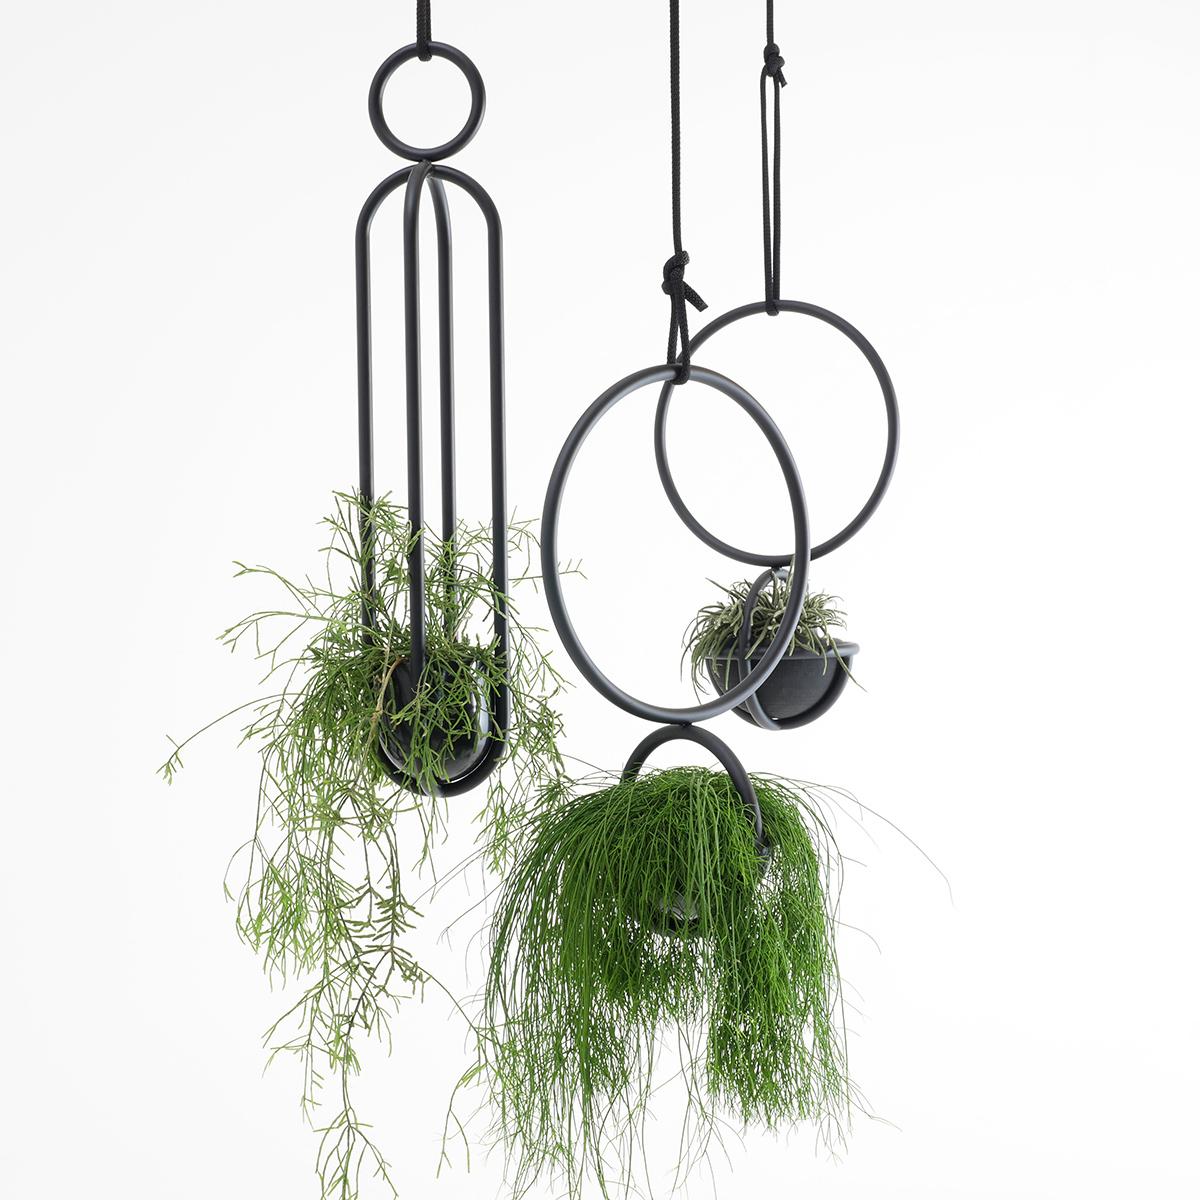 Blumenkugel and Blumenampel, hangingplants object from Zascho Petkow and Andreas Haussmann, vase from Birgit Severin